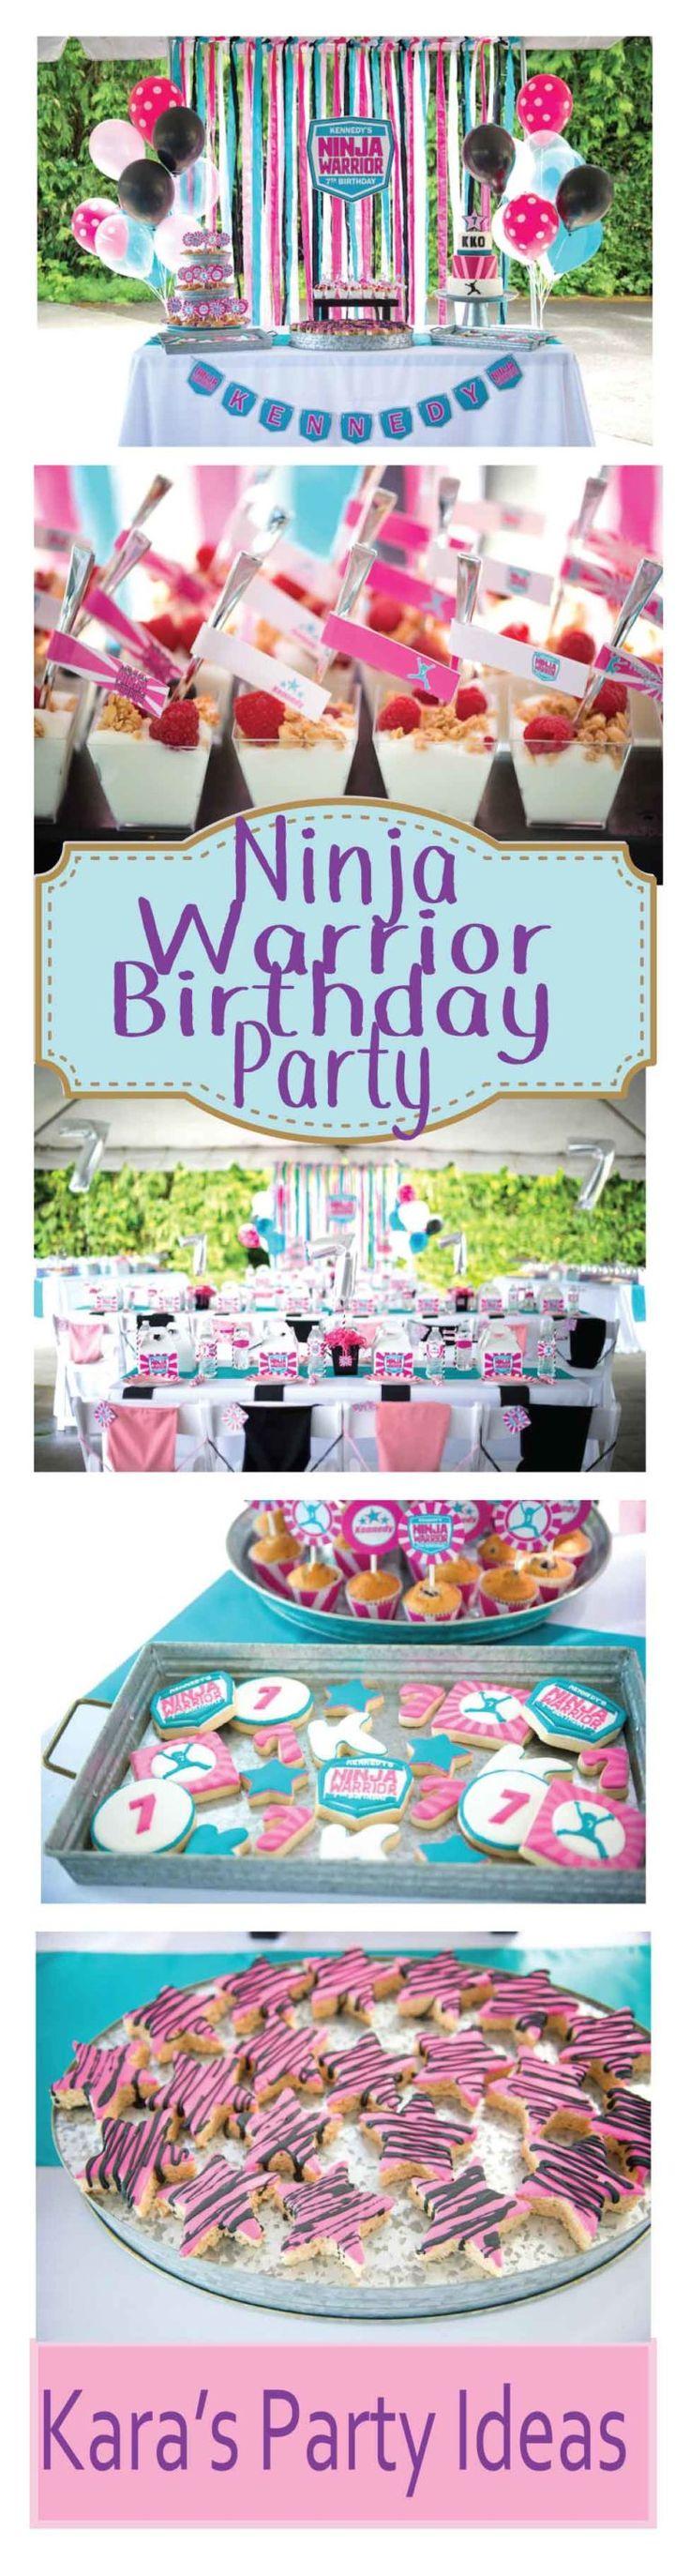 From kara s party ideas rustic dessert table display designed by - Ninja Warrior Birthday Party Via Kara S Party Ideas